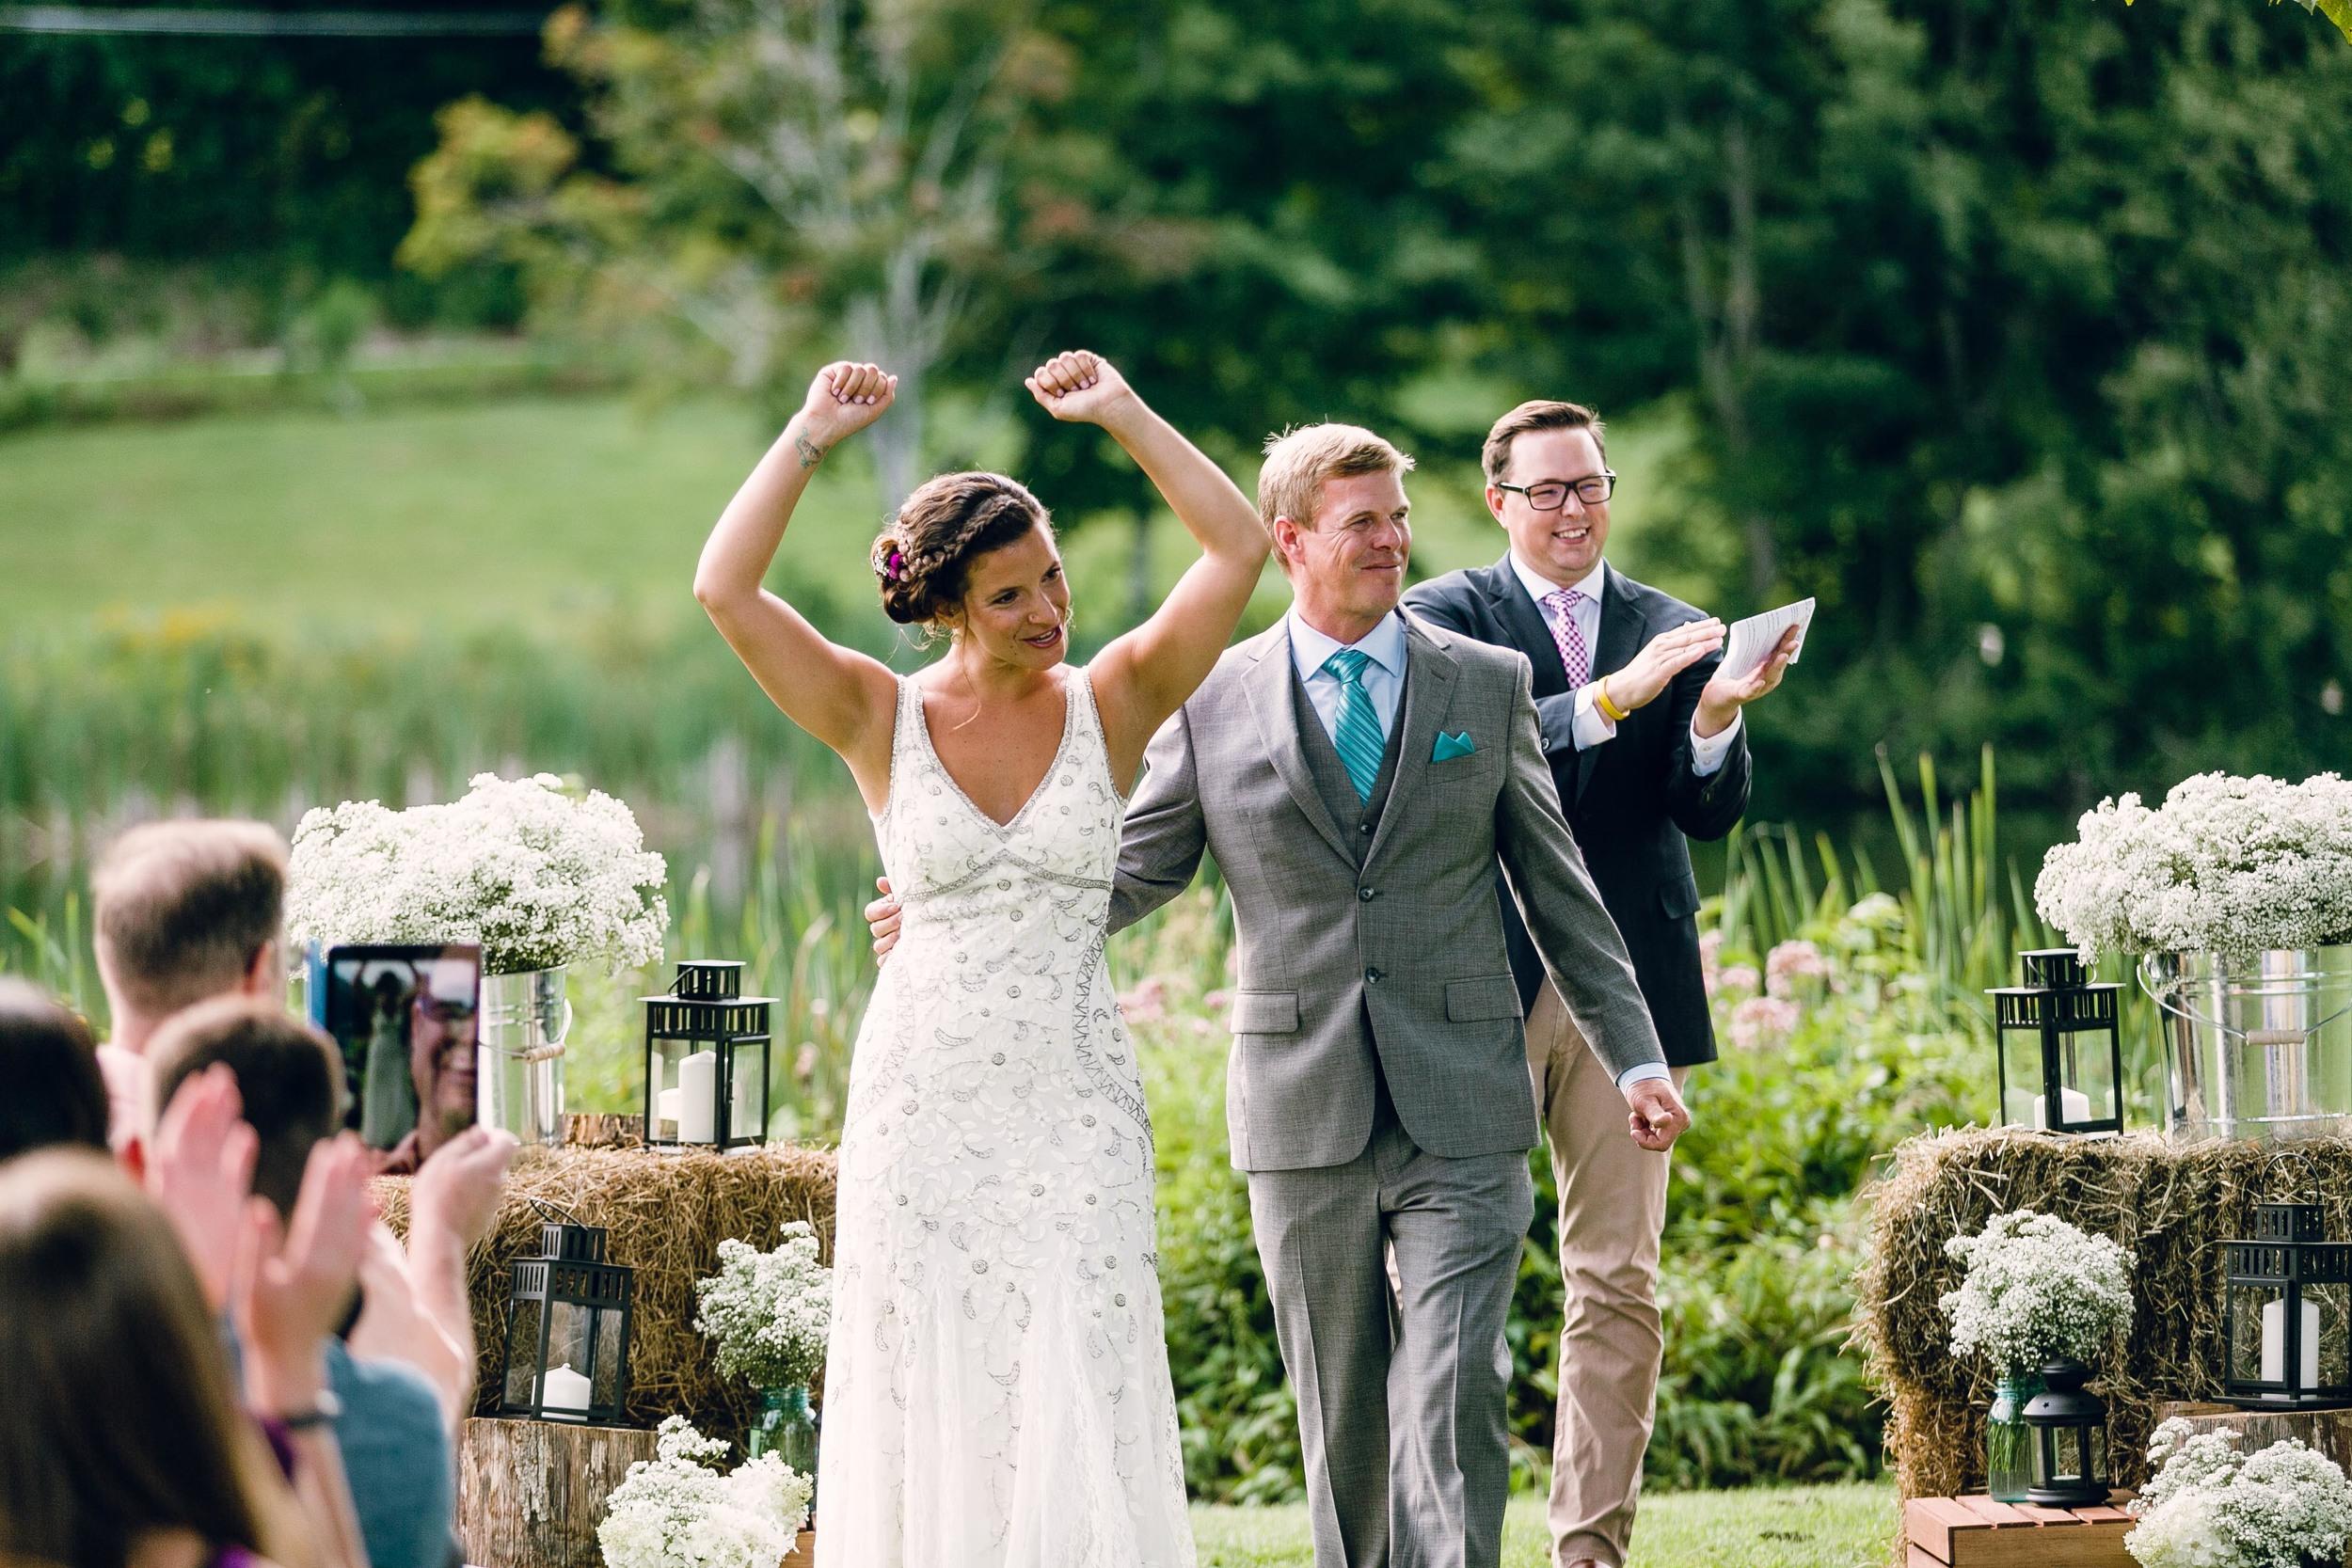 Rustic-Country-Style-Wedding-Connecticut-Farm-Photojornalistic-Wedding-Photography-by-Jacek-Dolata-10.jpg